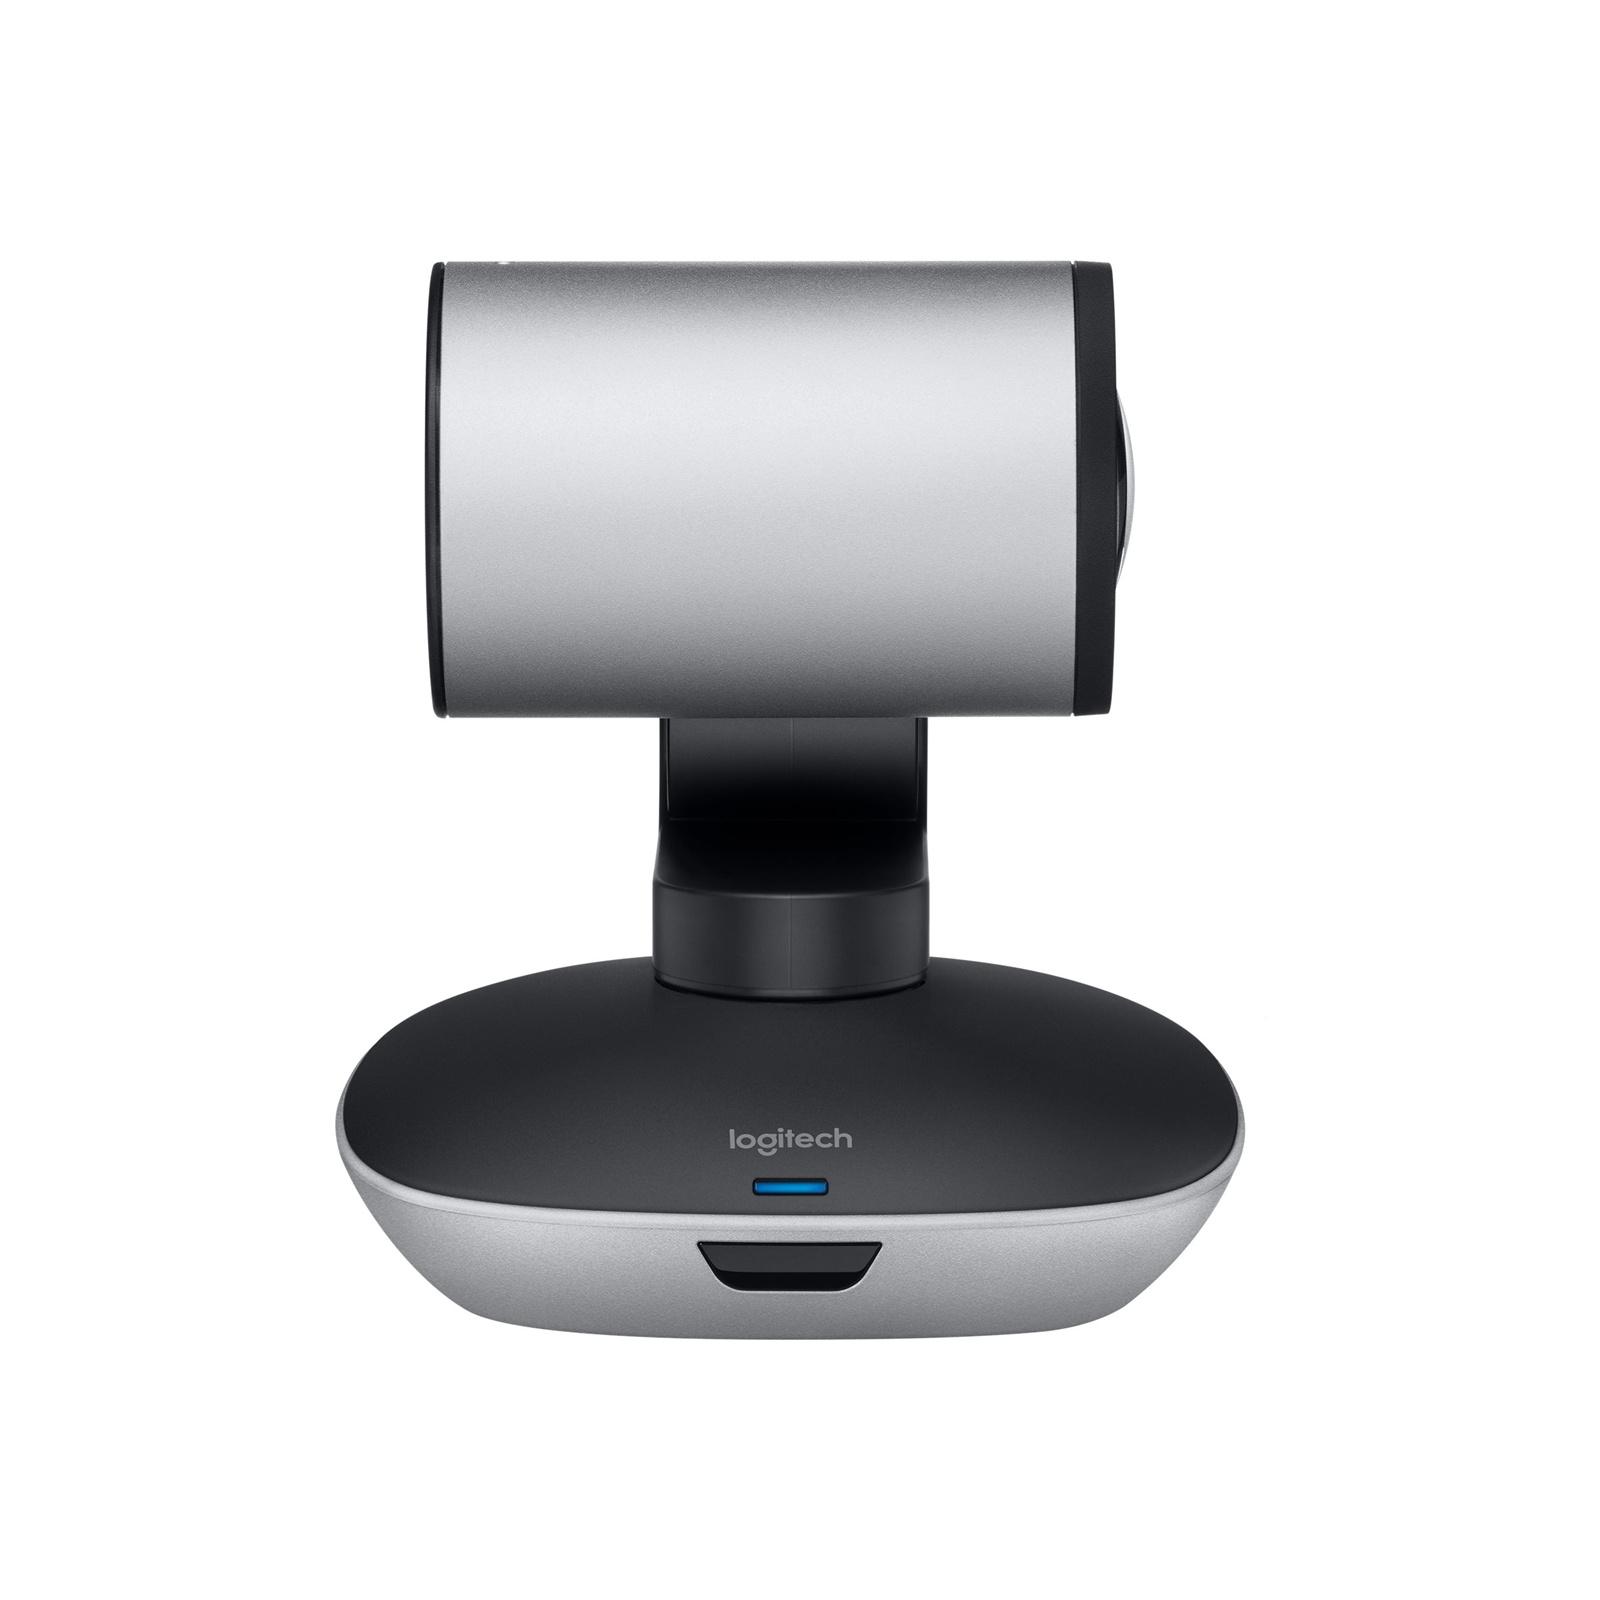 ed107e0db75 Buy the Logitech PTZ Pro 2 Profession Conference Camera ( 960-001184 ...